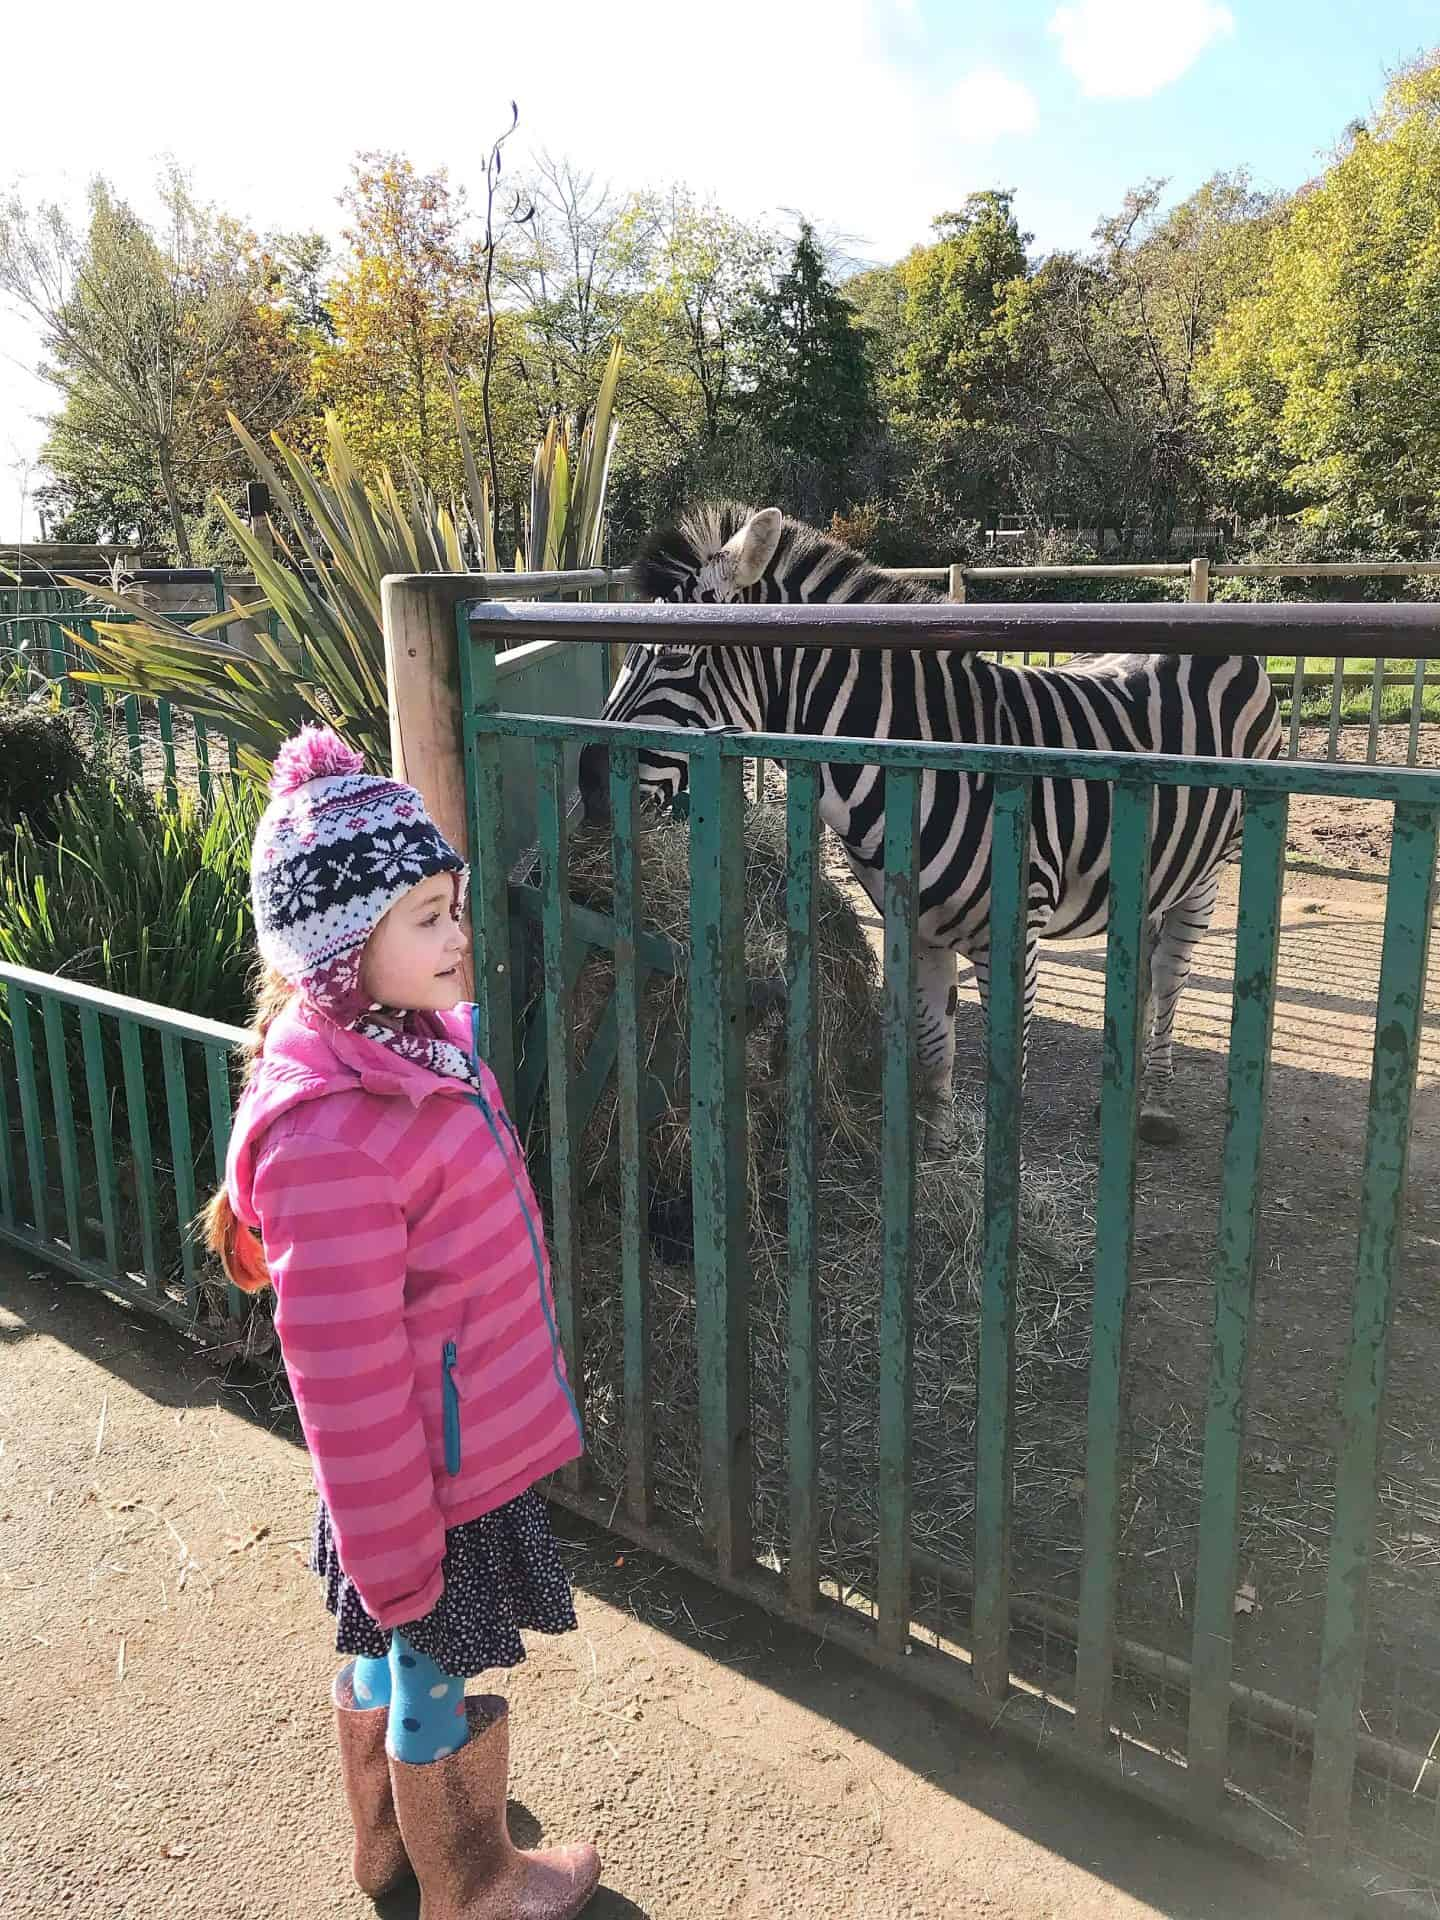 Meeting a real zebra